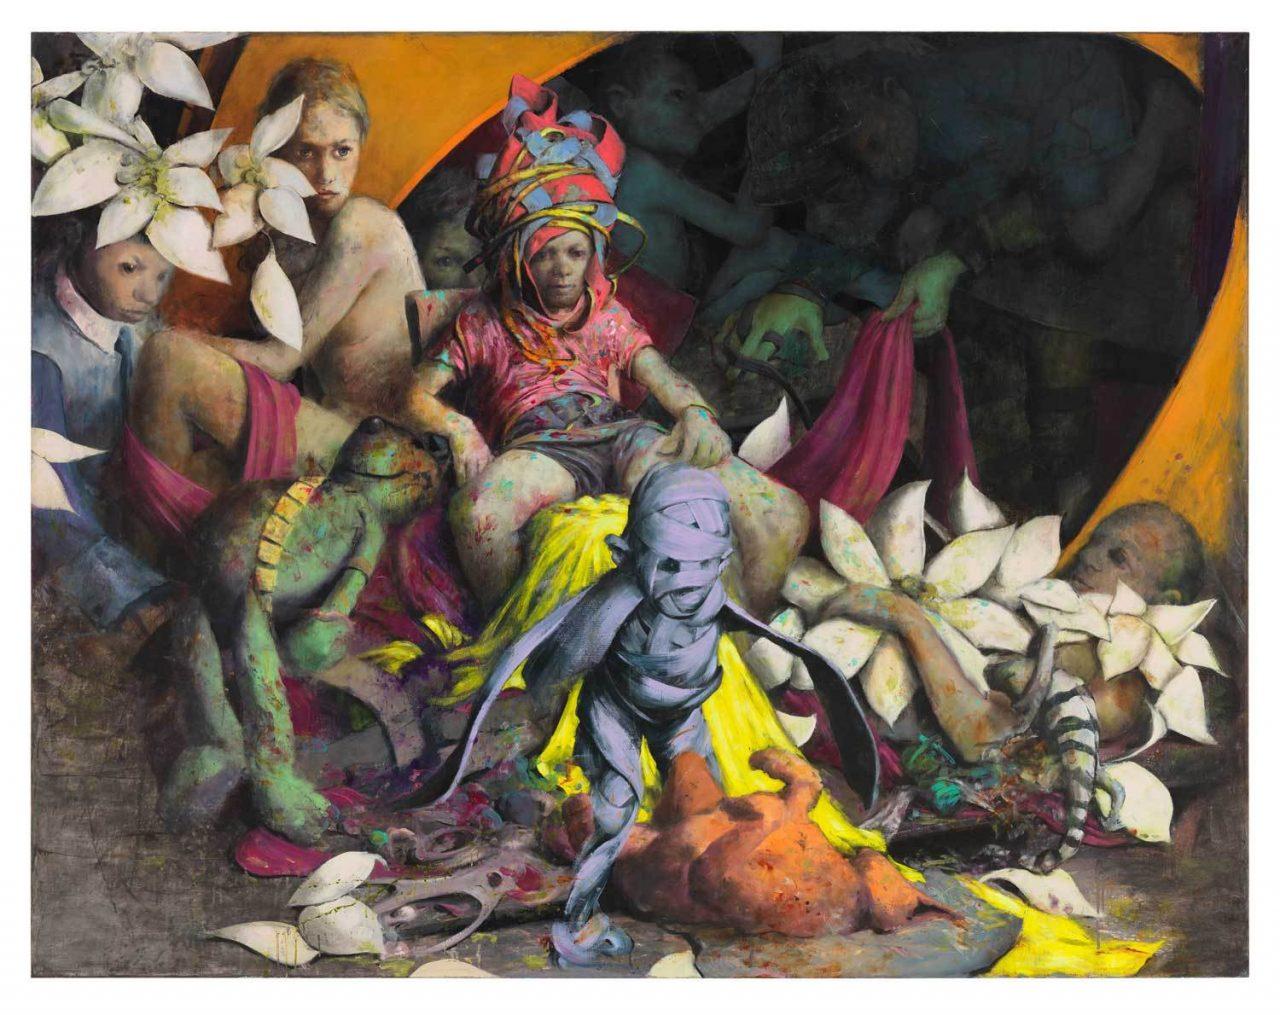 JONAS BURGERT's 'dark and dreamy artworks'  featured in Verve Magazine